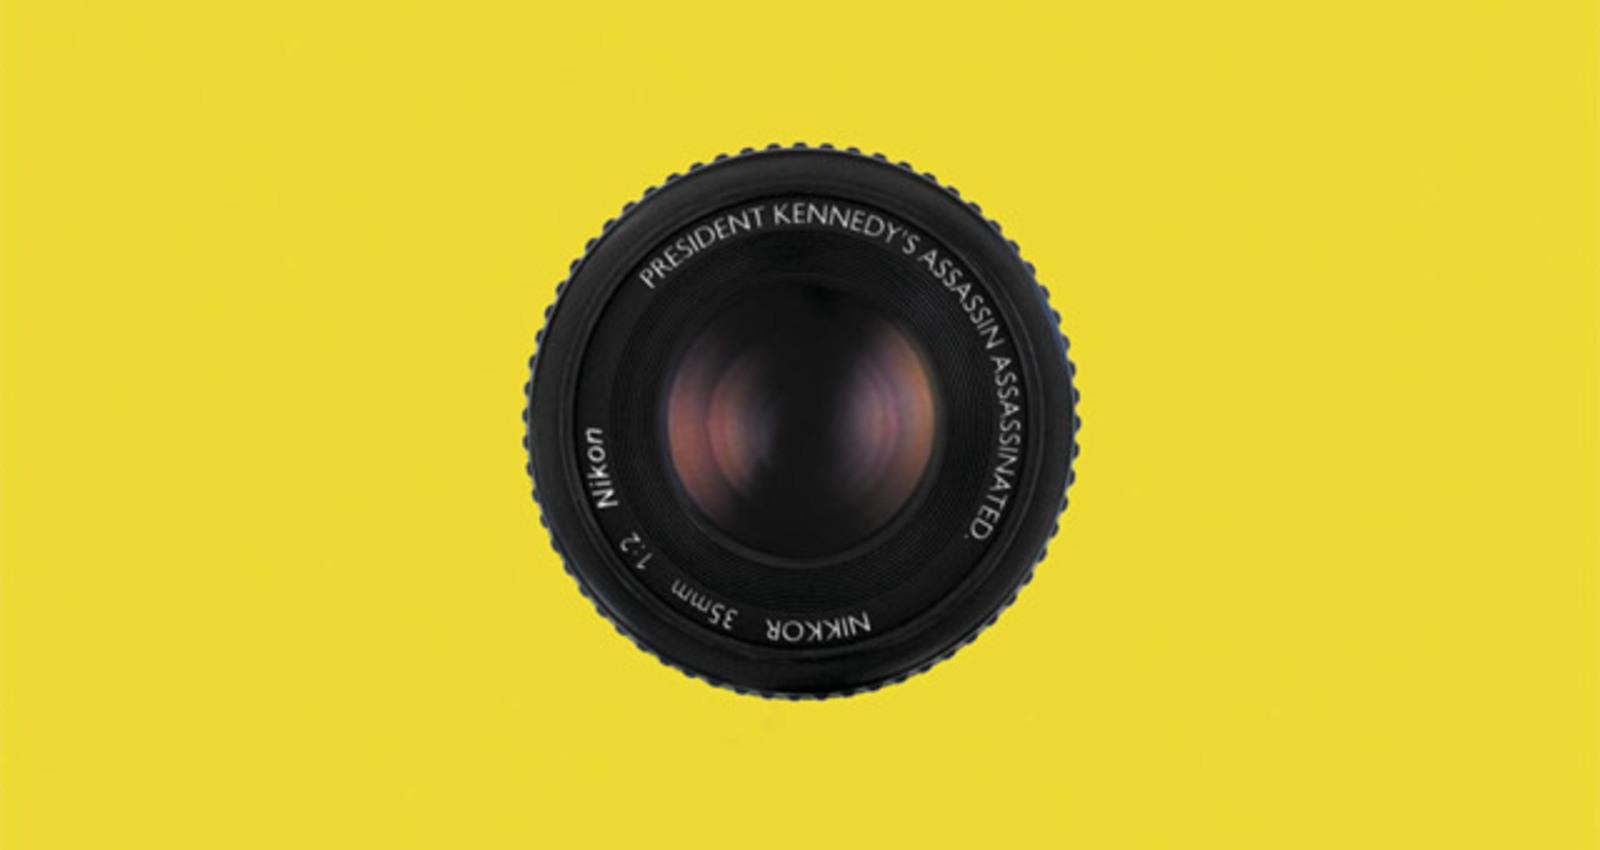 Nikkor Lenses